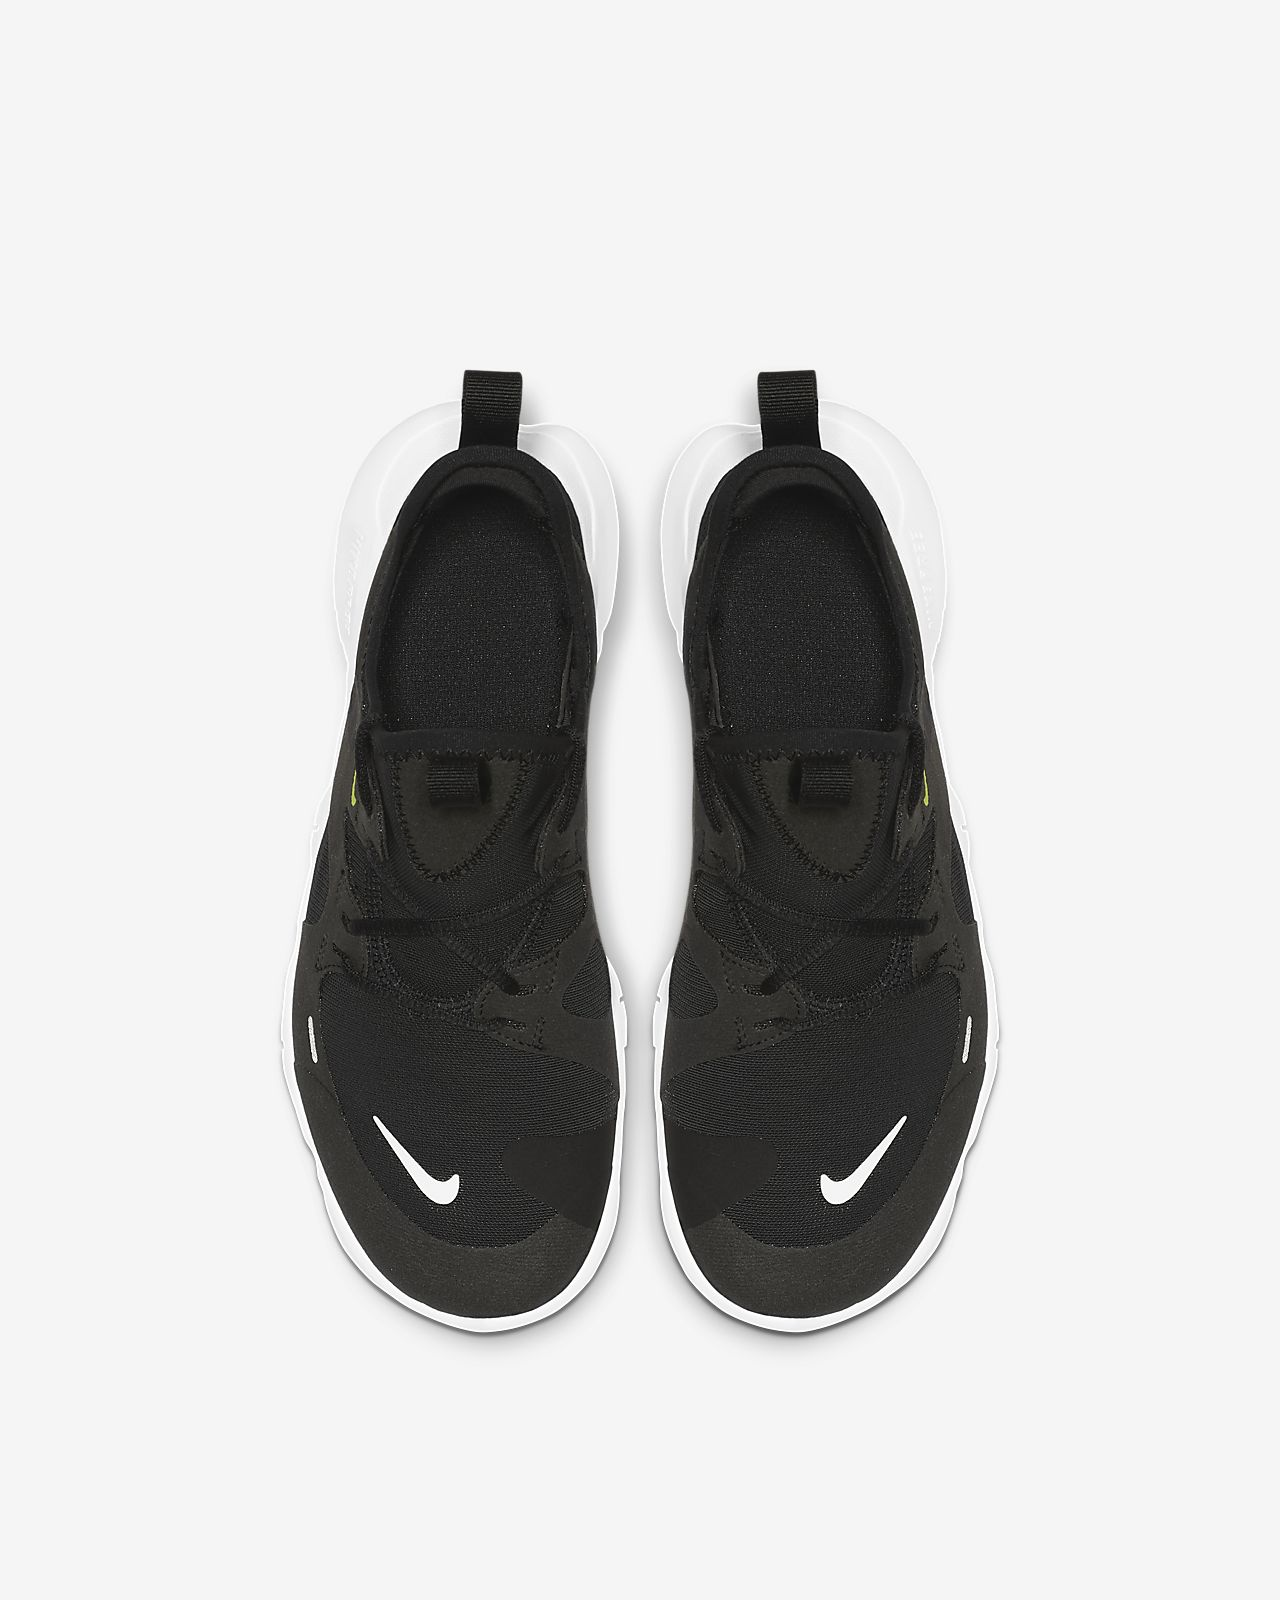 Nike Free RN 5,0 Zapatillas de running Niñoa